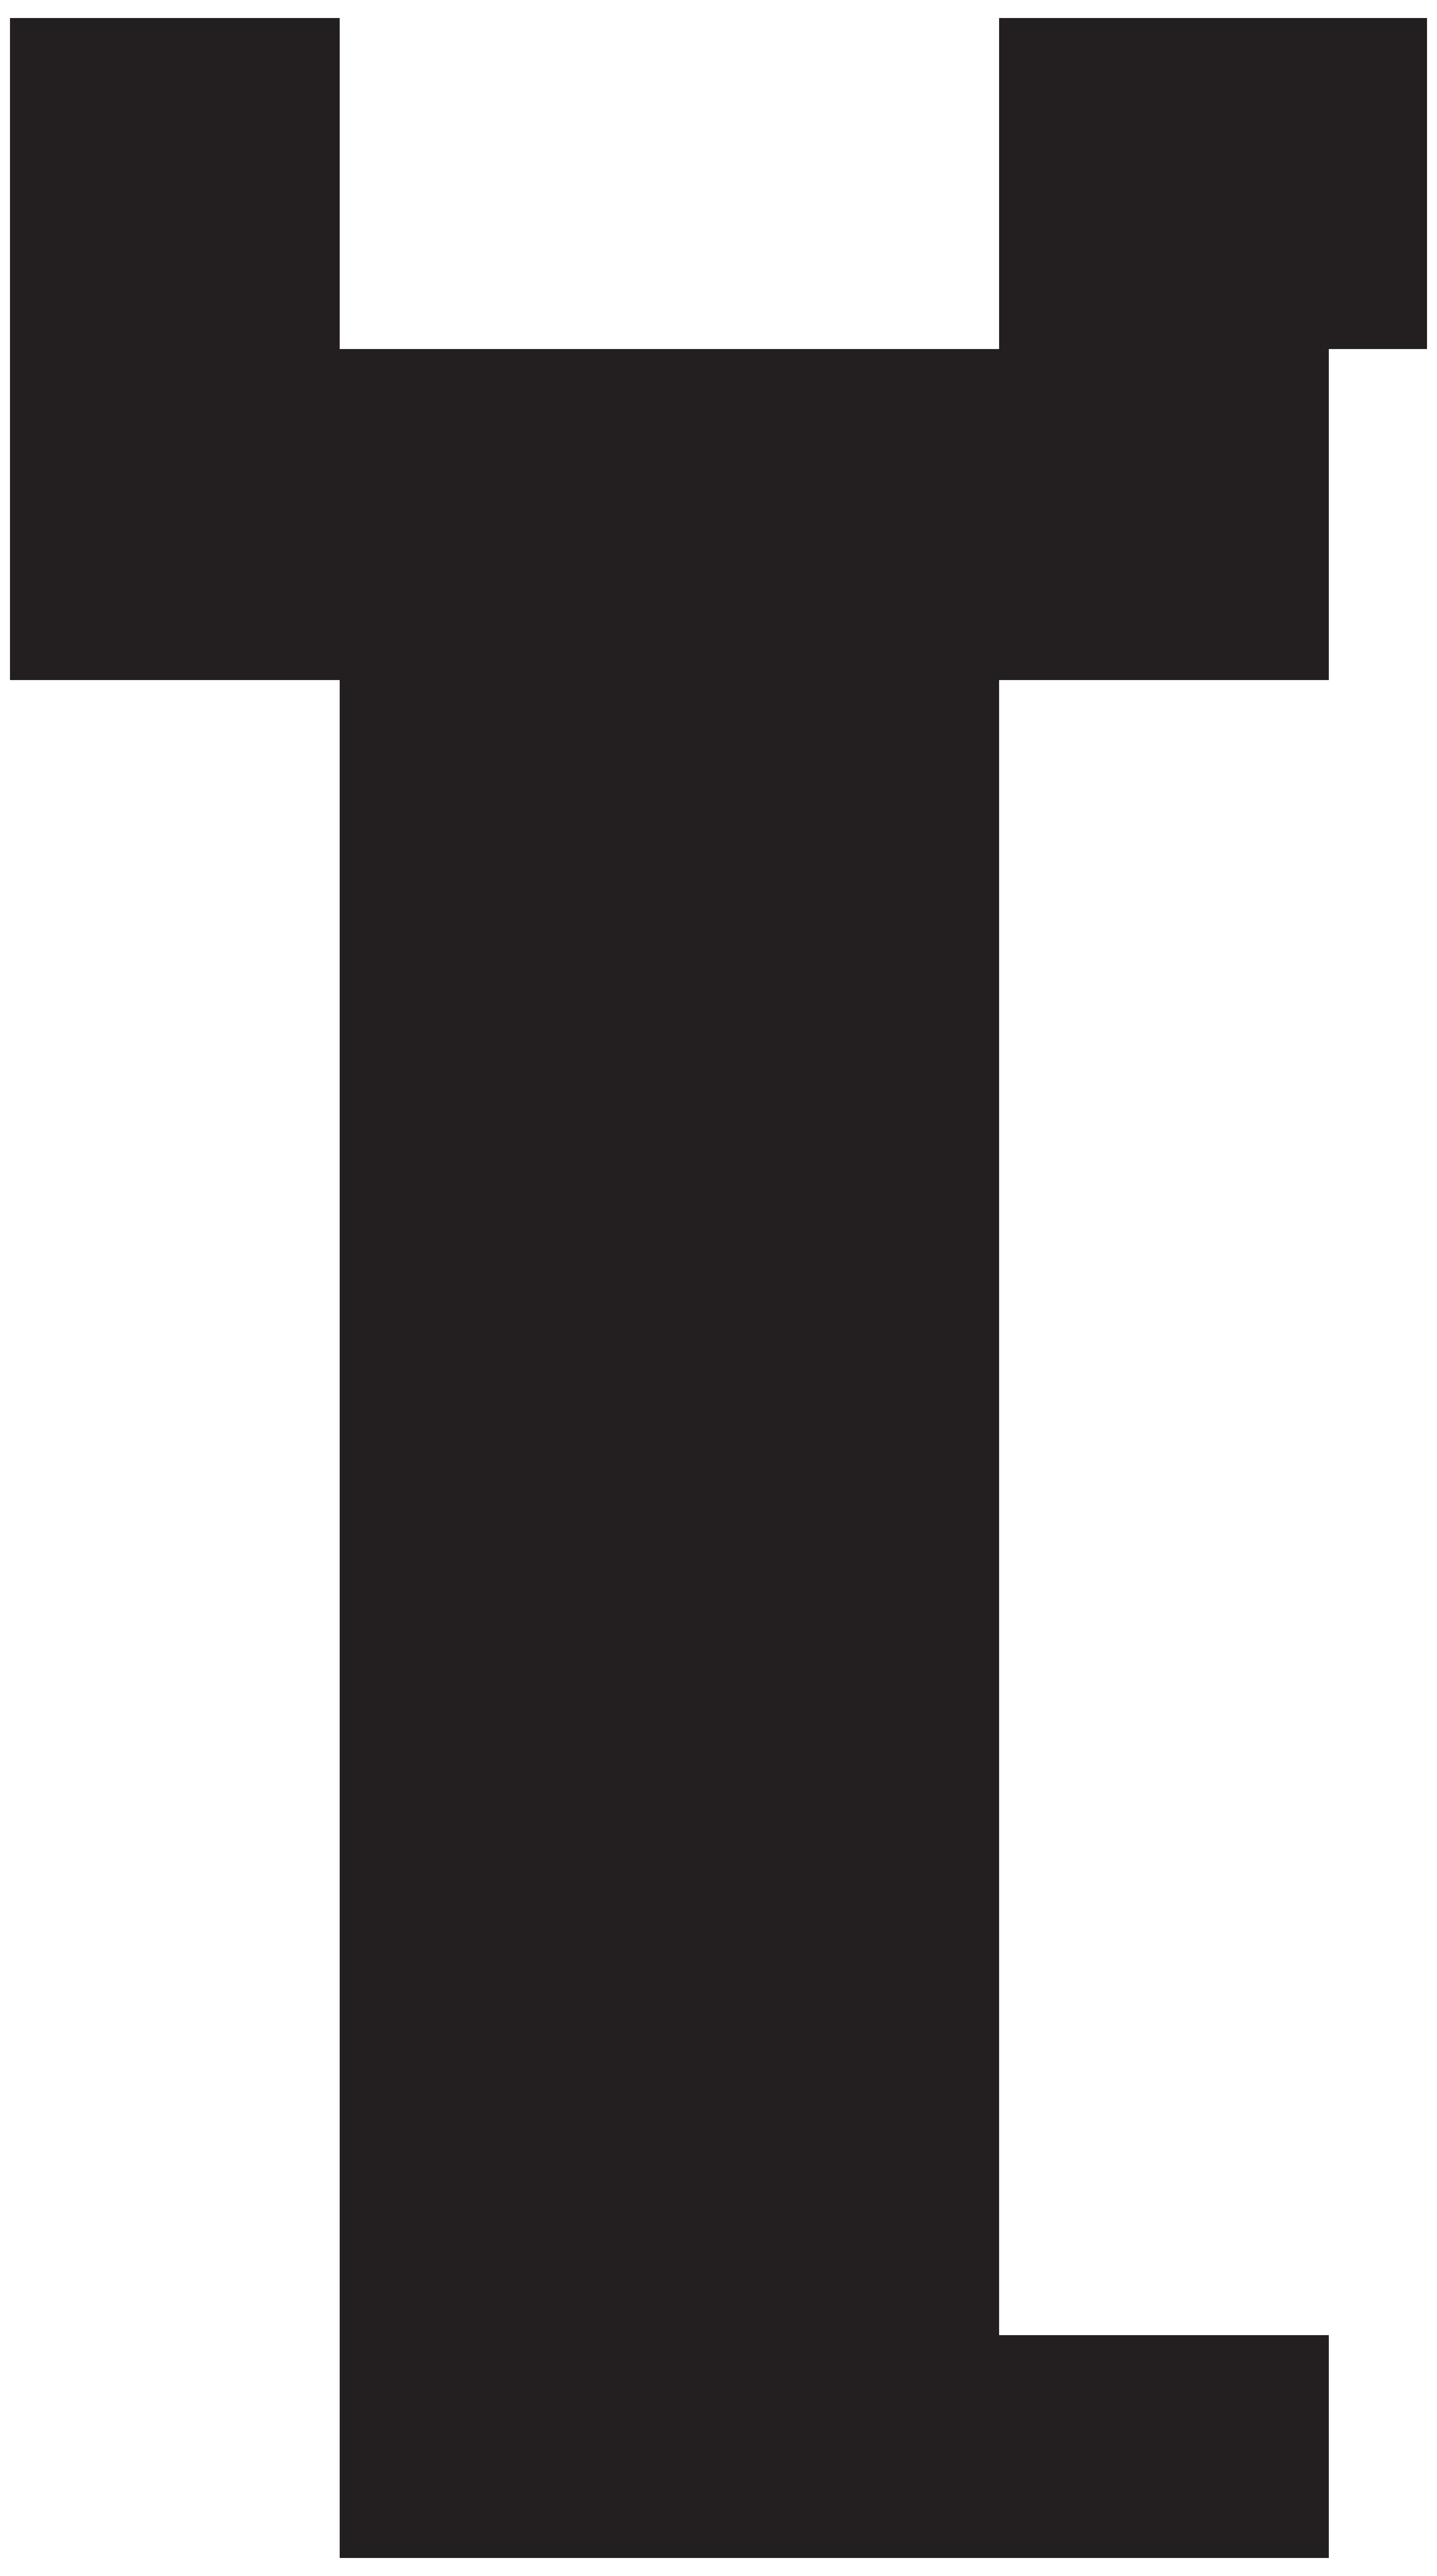 Boy Silhouette PNG Clip Art Image.